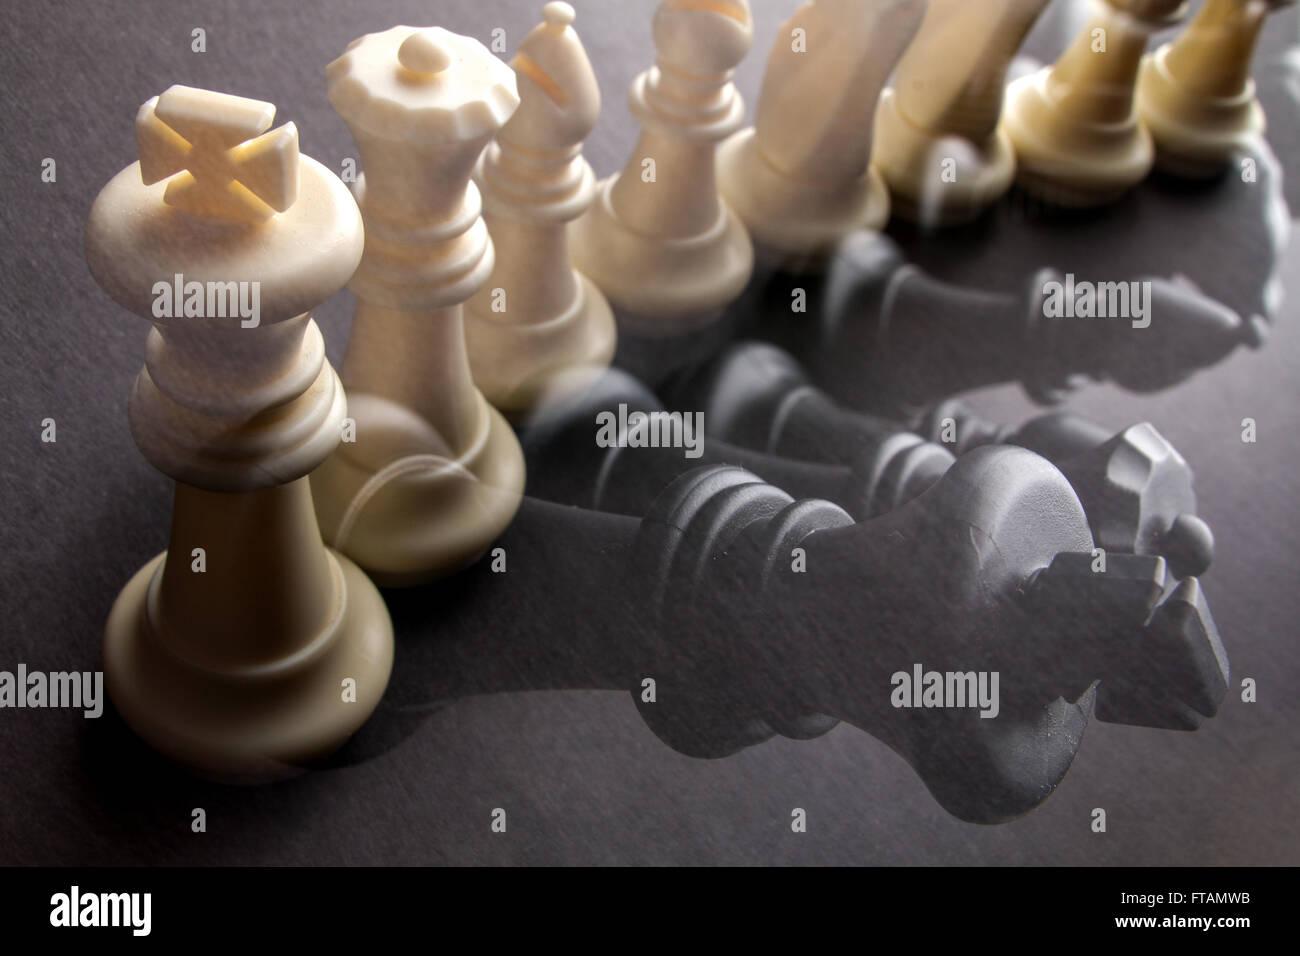 row chessmen Multiple chess background image illustration - Stock Image